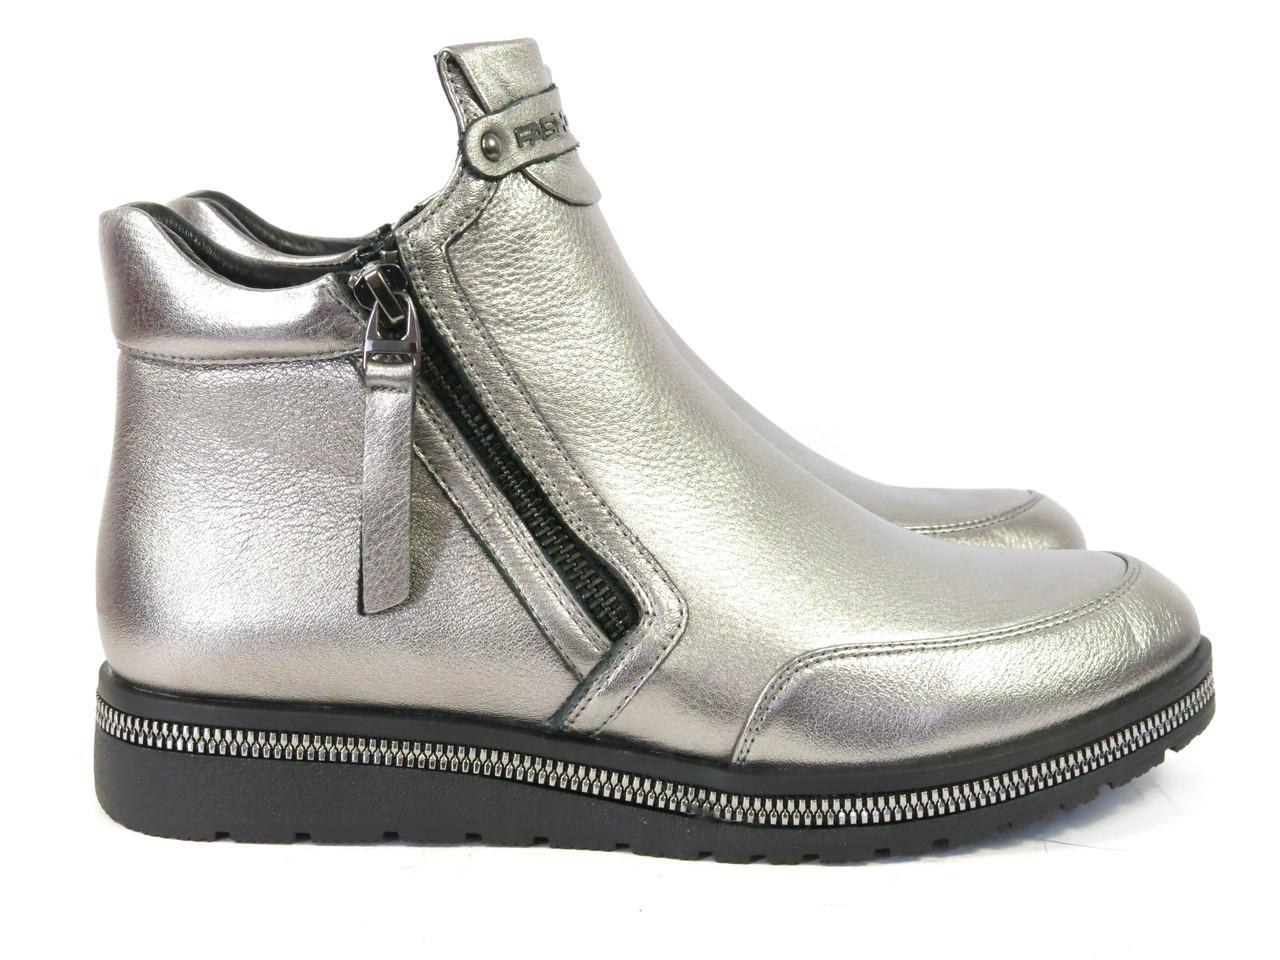 Ботинки на танкетке серебристого цвета, фото 1